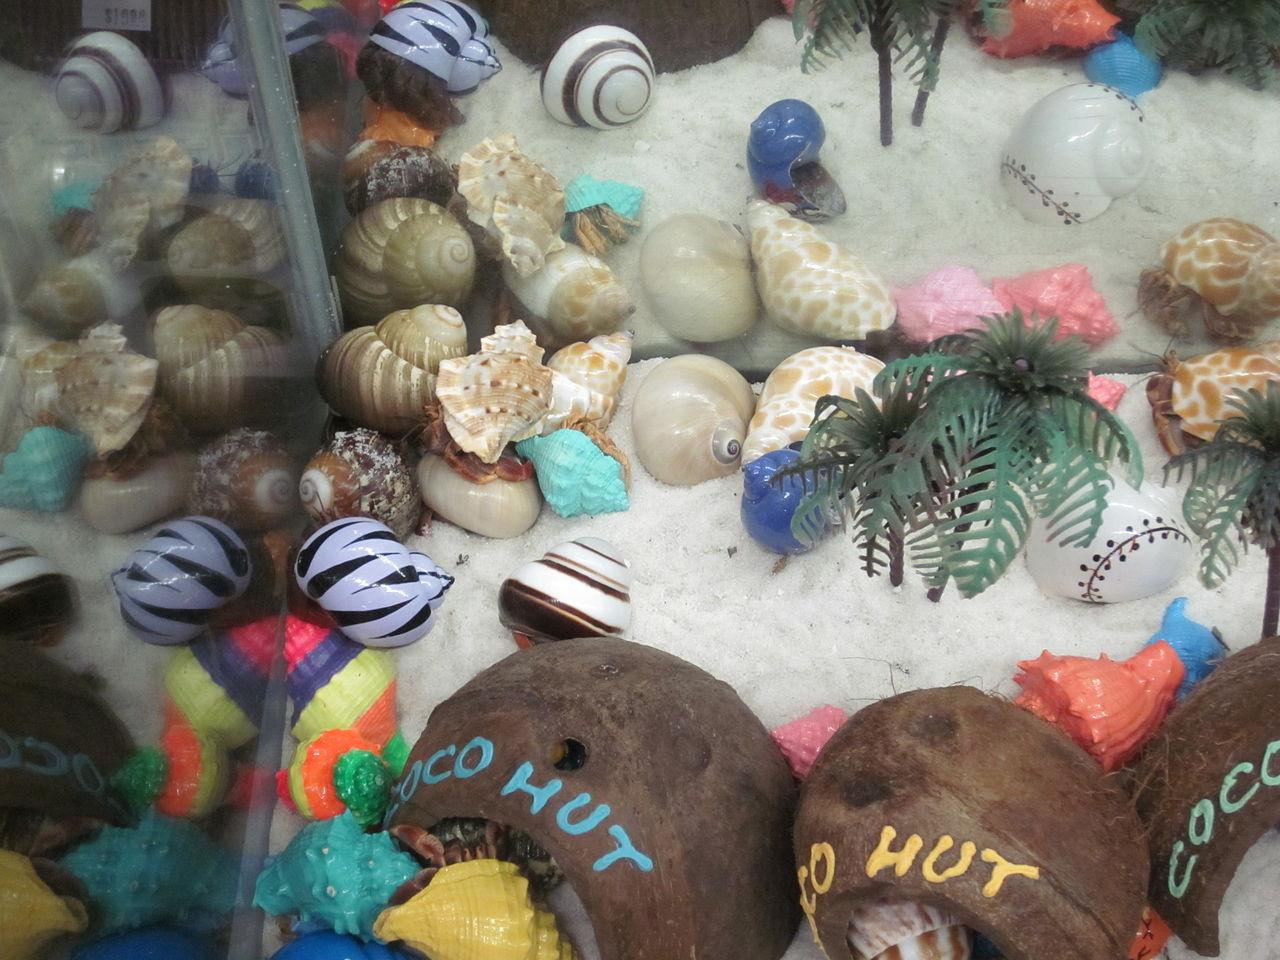 Aquarium City Pet Shop Christies Beach